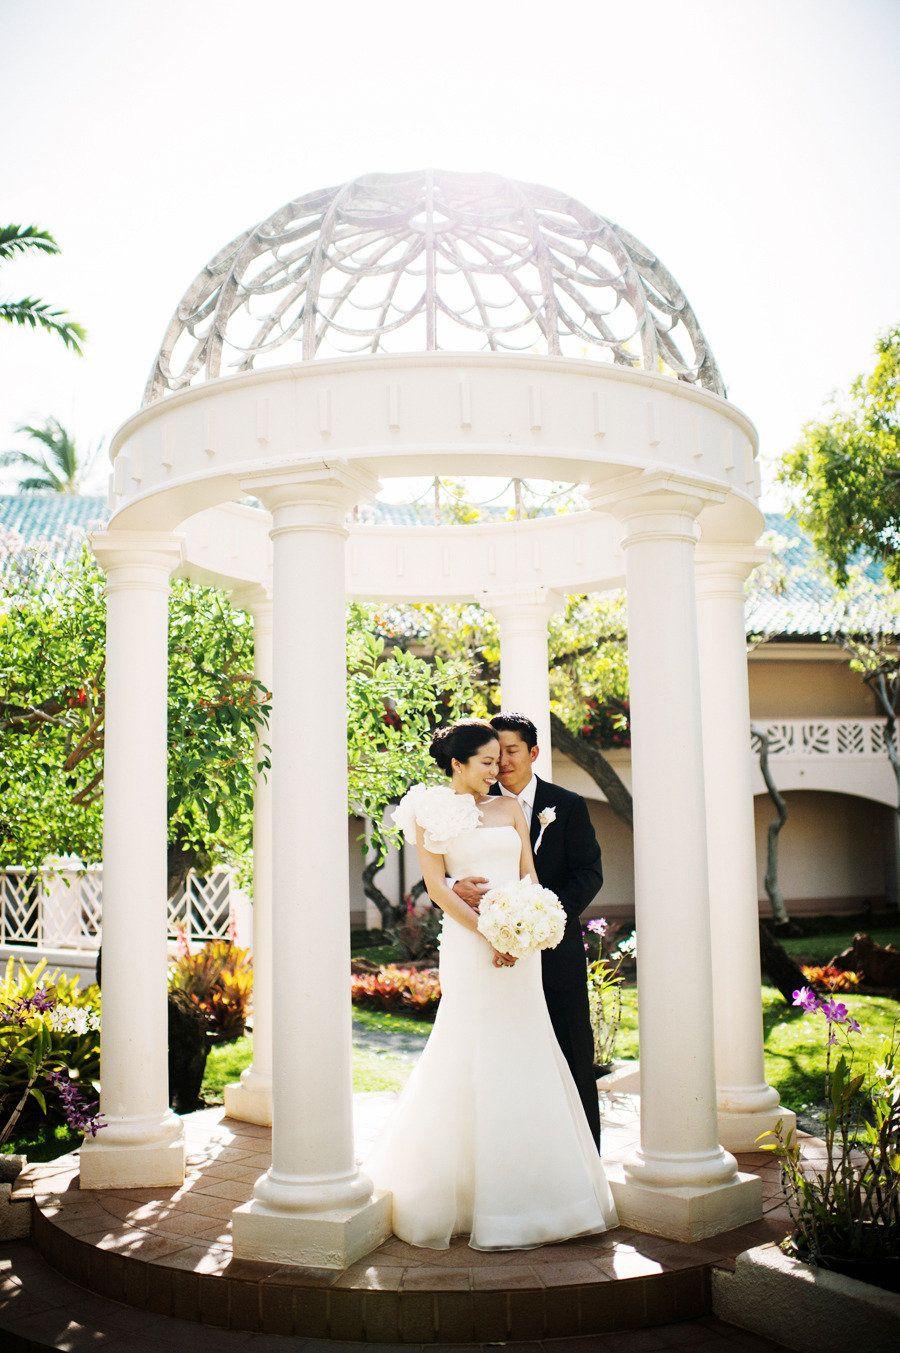 Photography: Christie Pham Photography - christie-photography.com Event Coordination: Nichole Weddings & Events, LLC - nicholeweddings.com Floral Design: Yvonne Design - yvonnedesign.com  Read More: http://www.stylemepretty.com/2013/05/29/lanai-wedding-from-nichole-weddings-events-christie-pham-photography-yvonne-design/